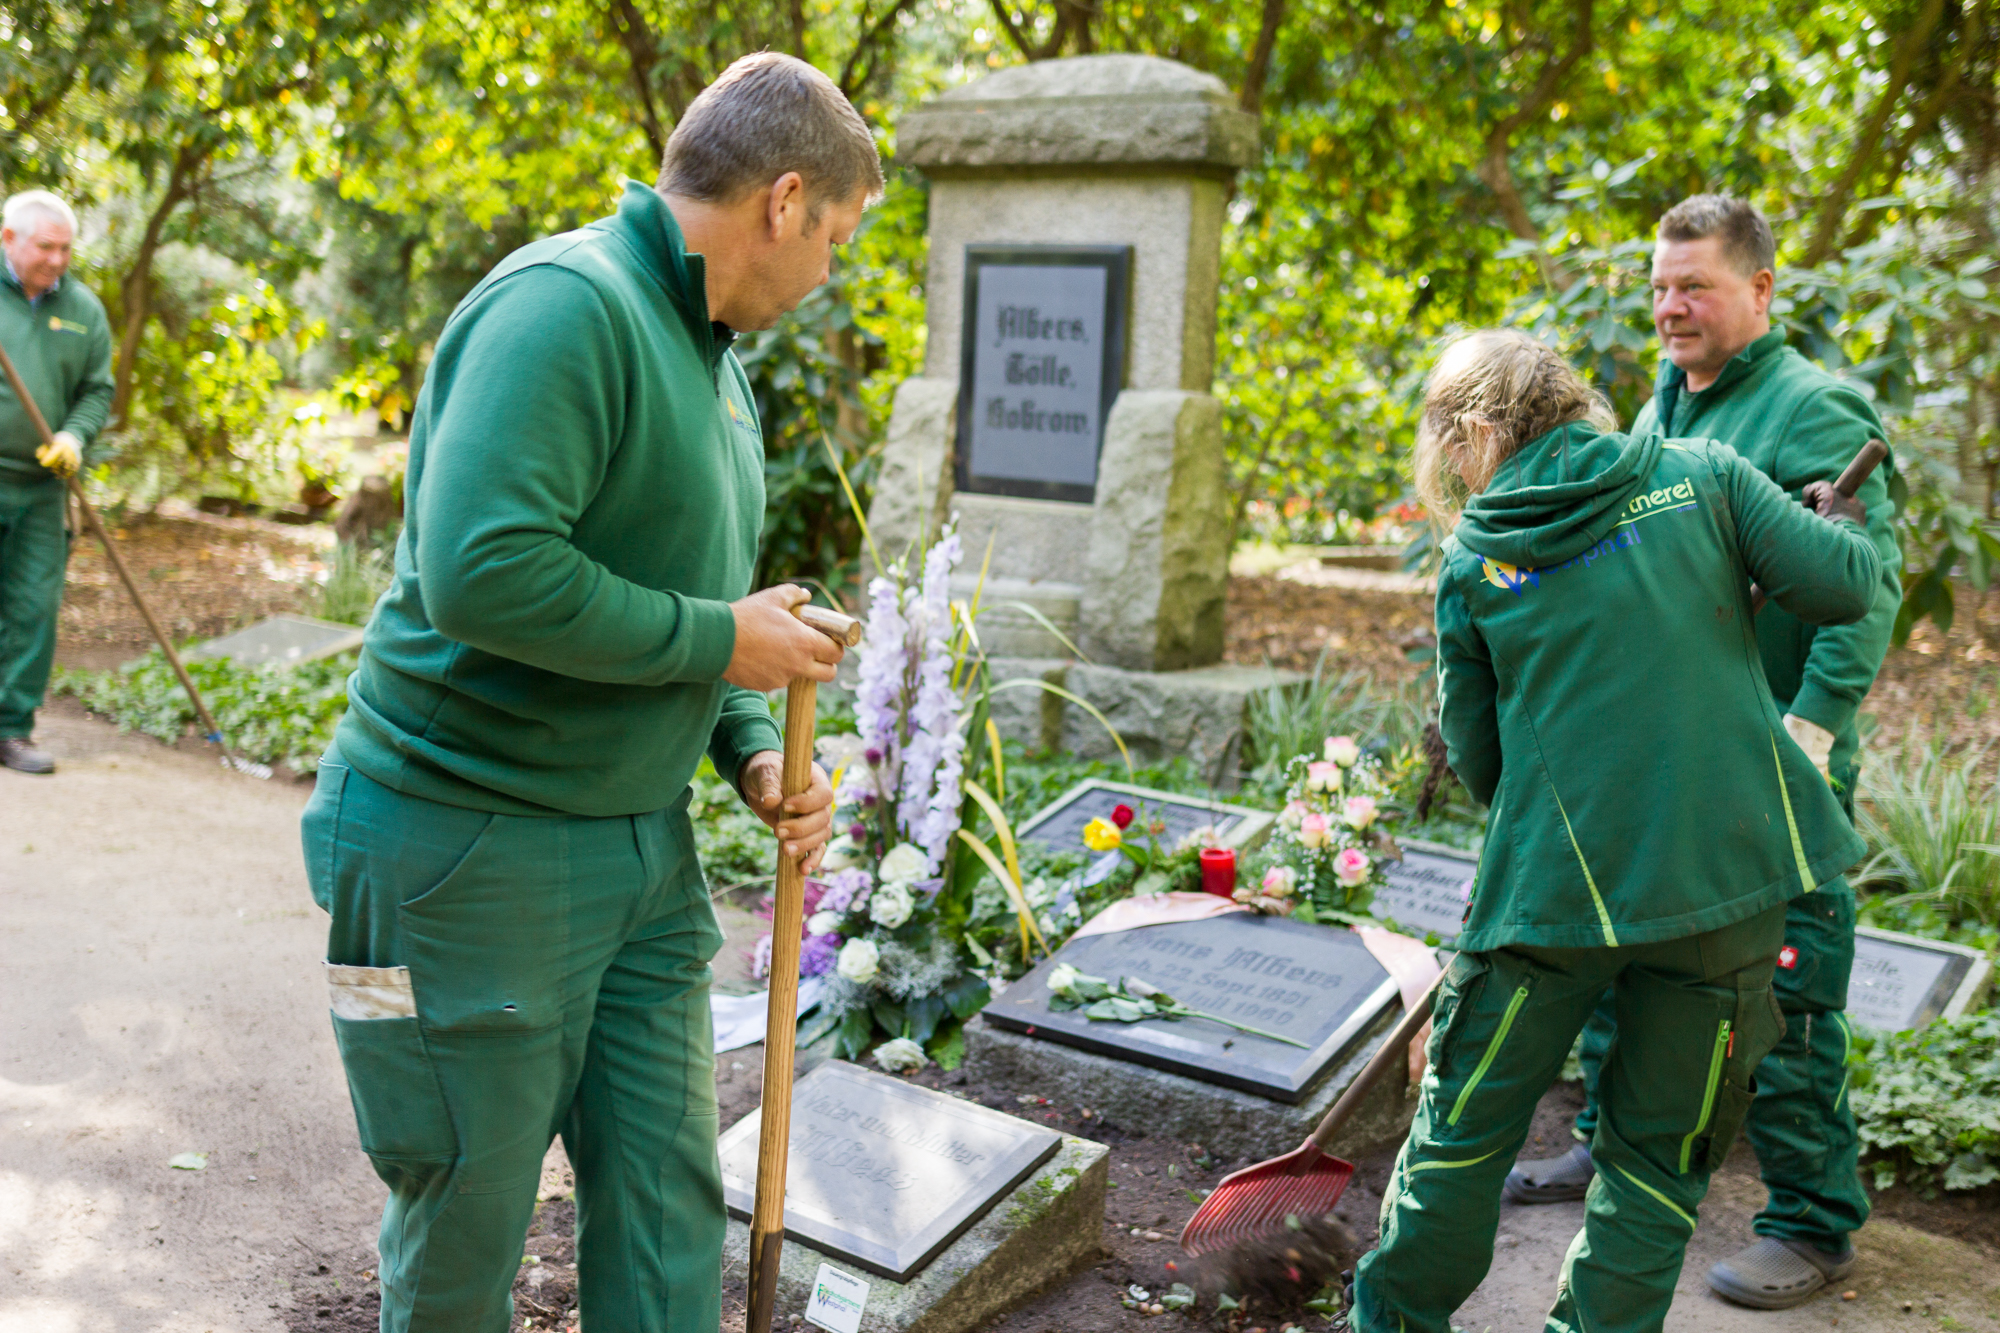 Friedhofsgärtnerei Westphal